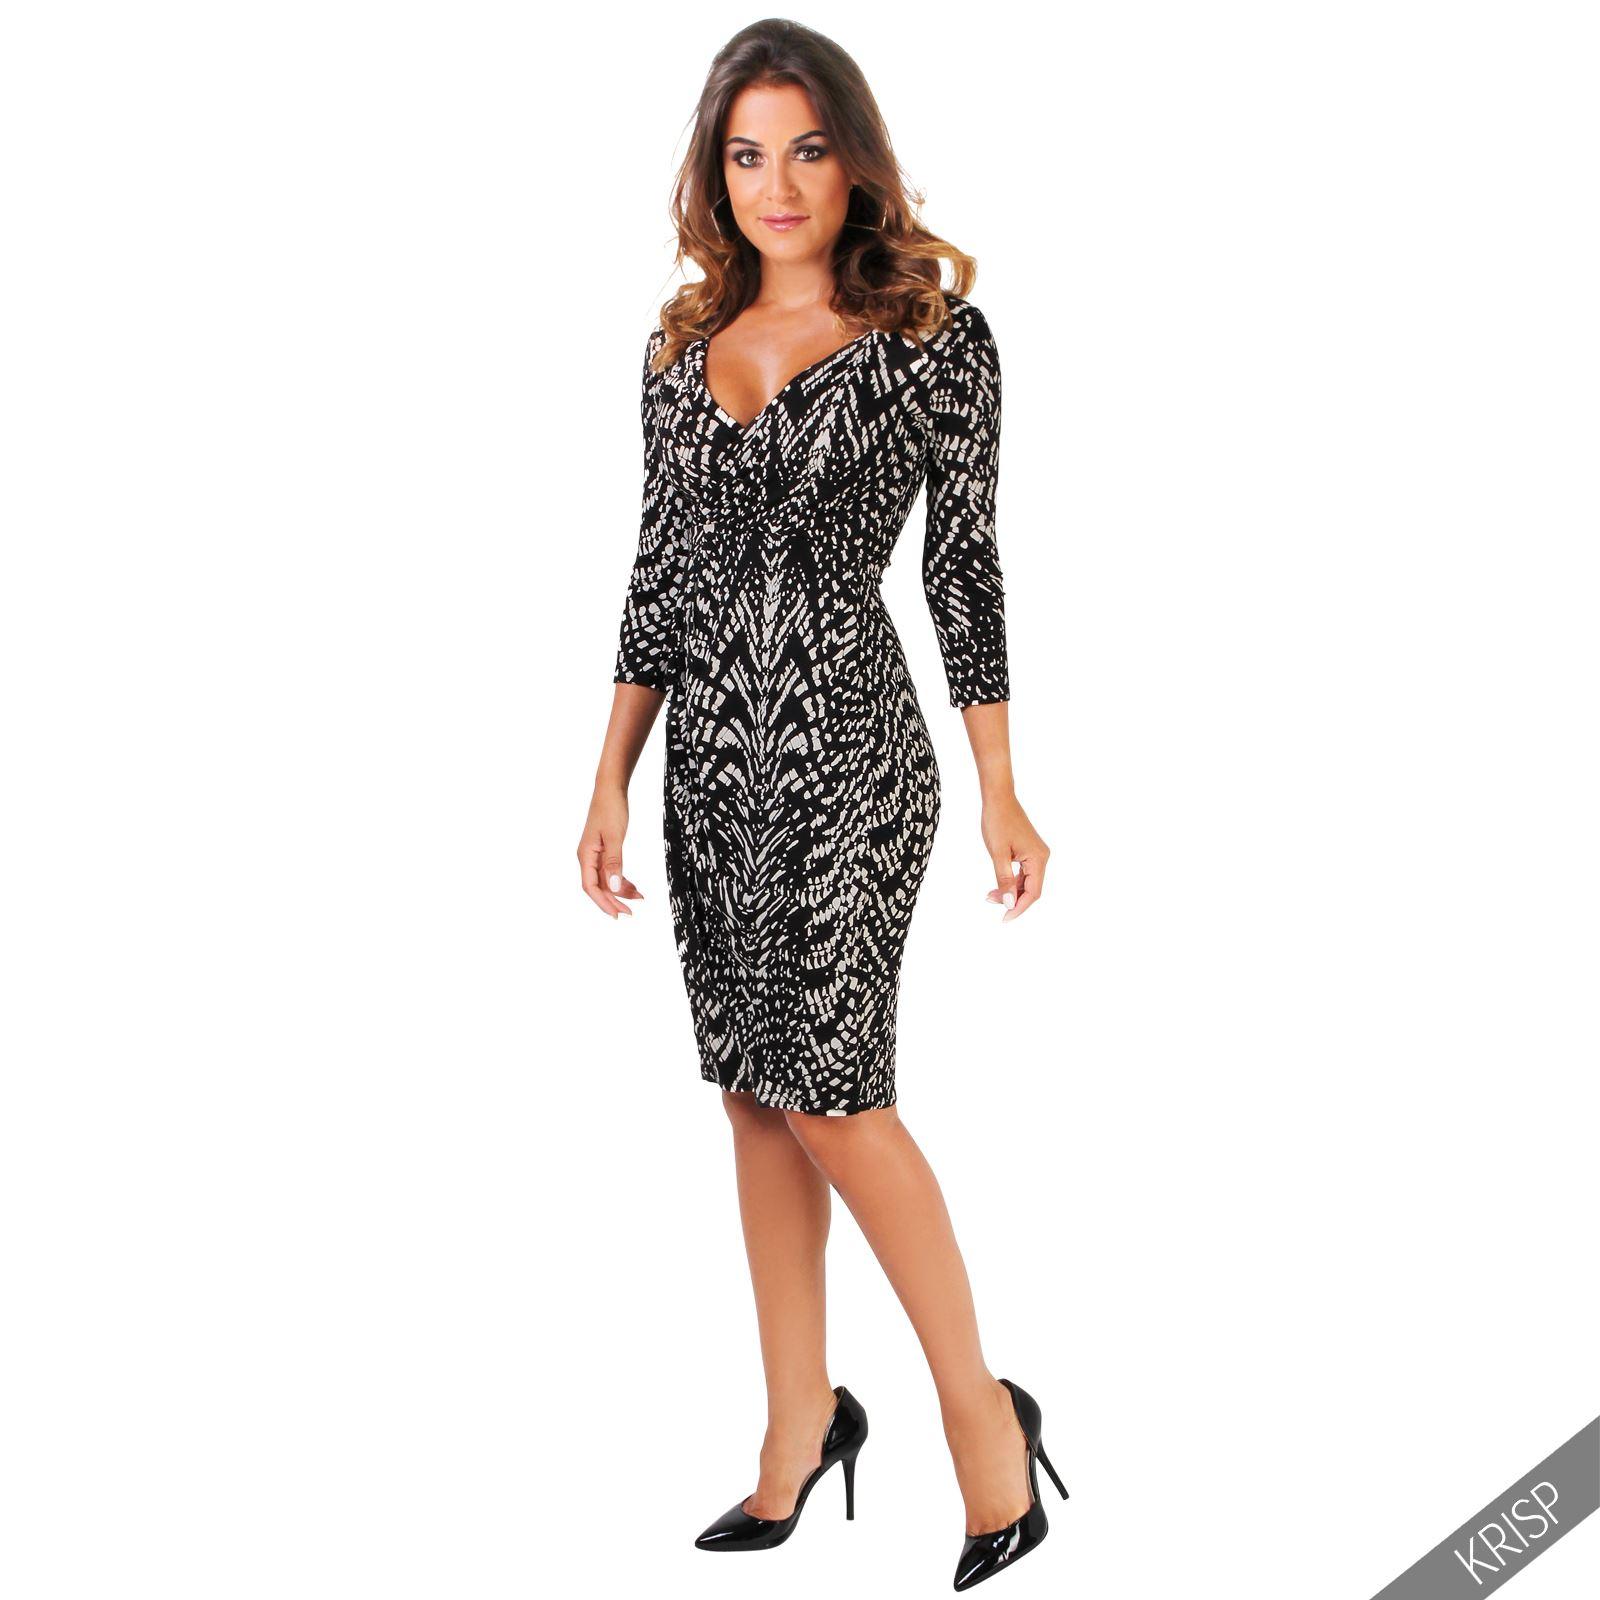 Womens-V-Neck-Dress-Top-Bodycon-Skirt-Midi-Snakeskin-Print-Cross-Over-Party-Wrap thumbnail 15